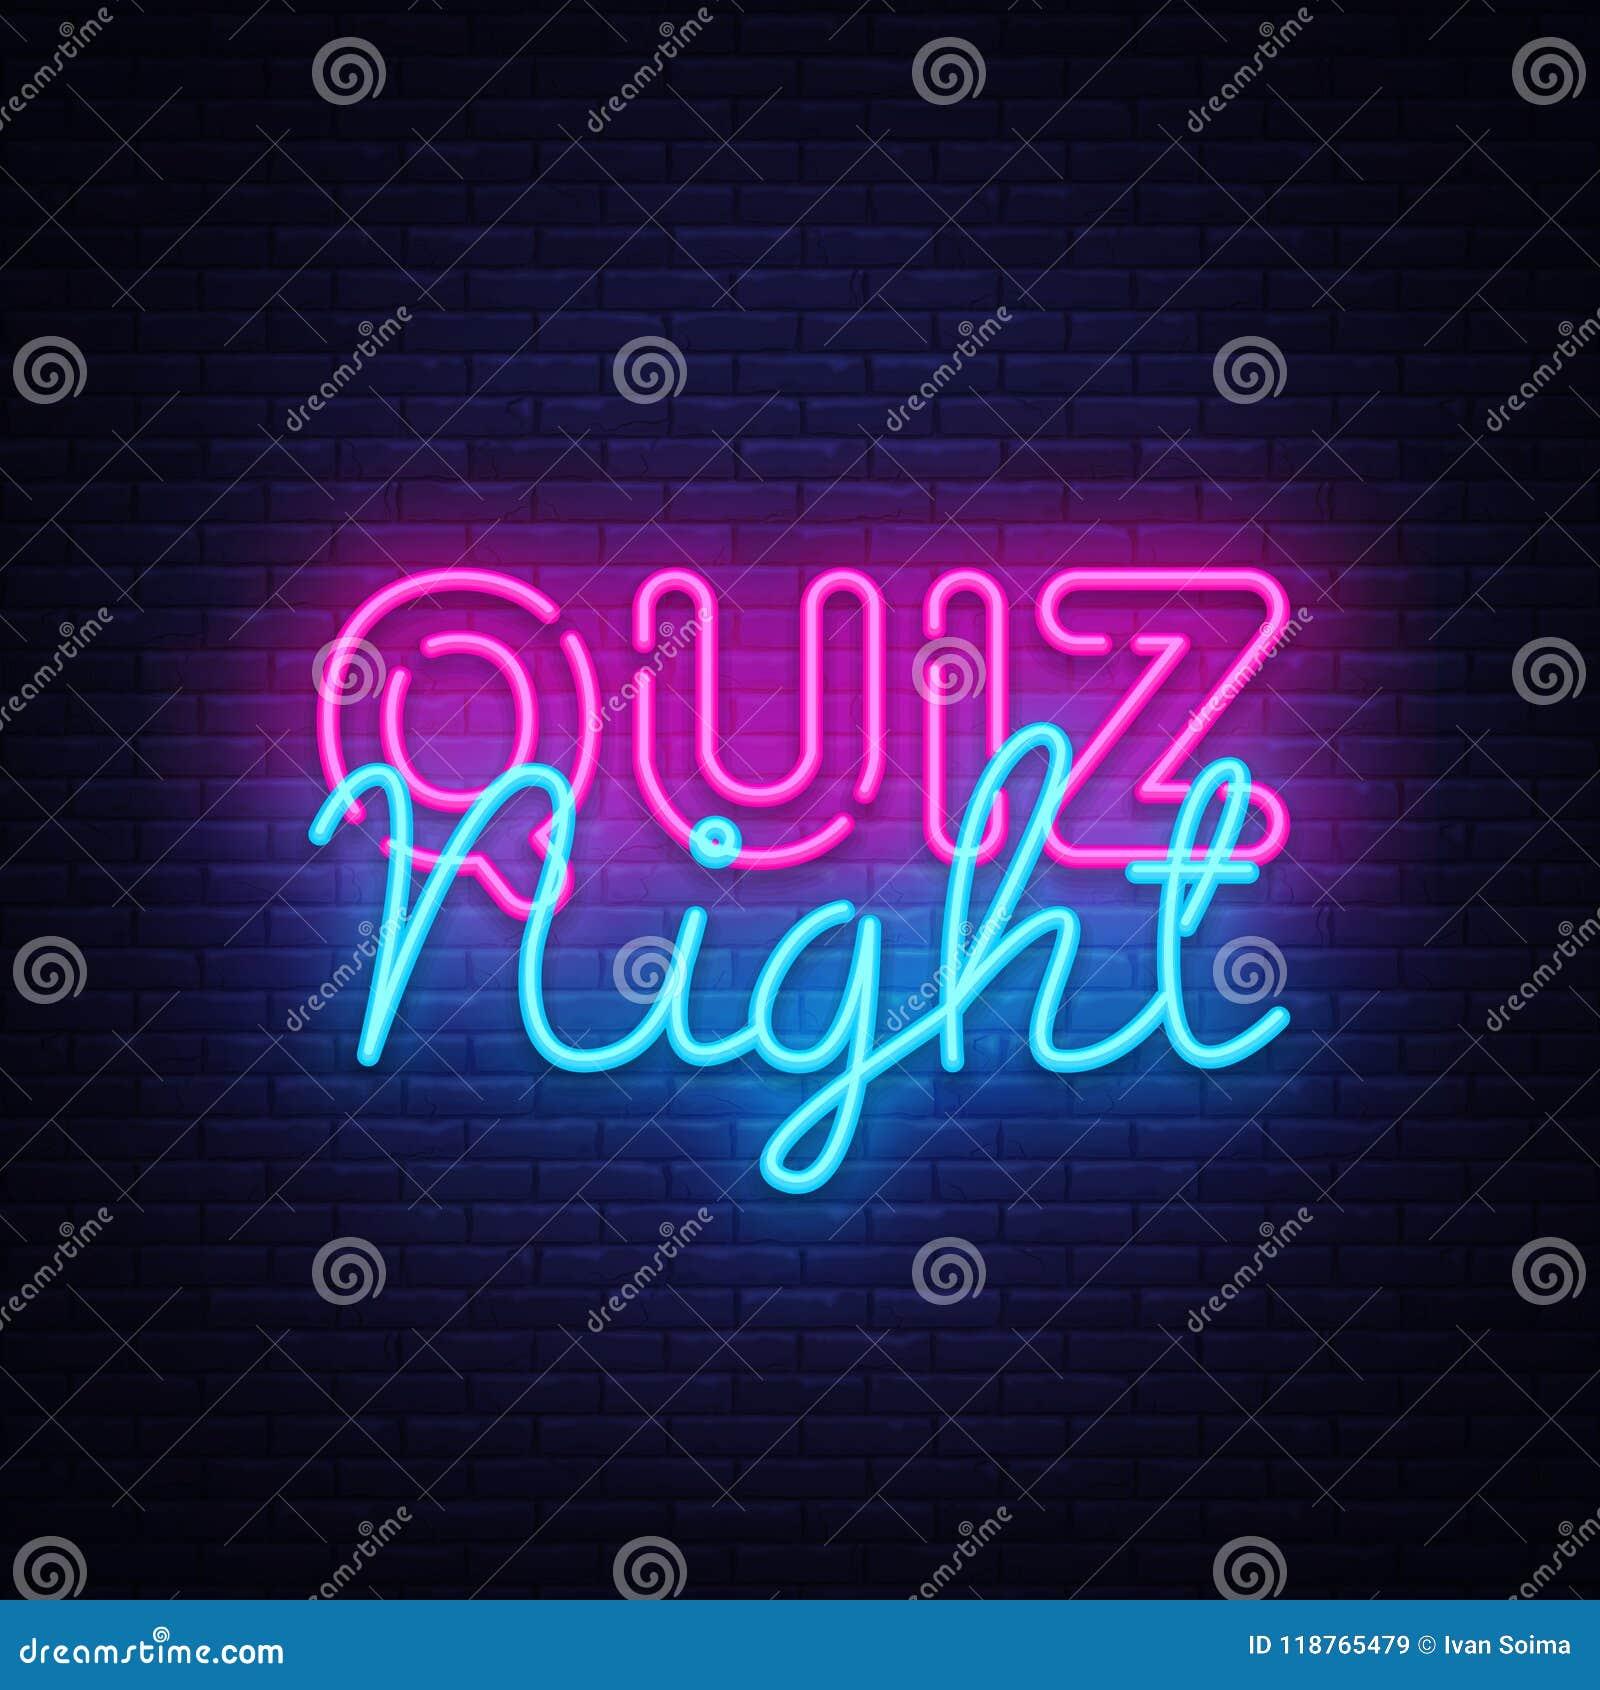 Quiz night announcement poster vector design template. Quiz night neon signboard, light banner. Pub quiz held in pub or